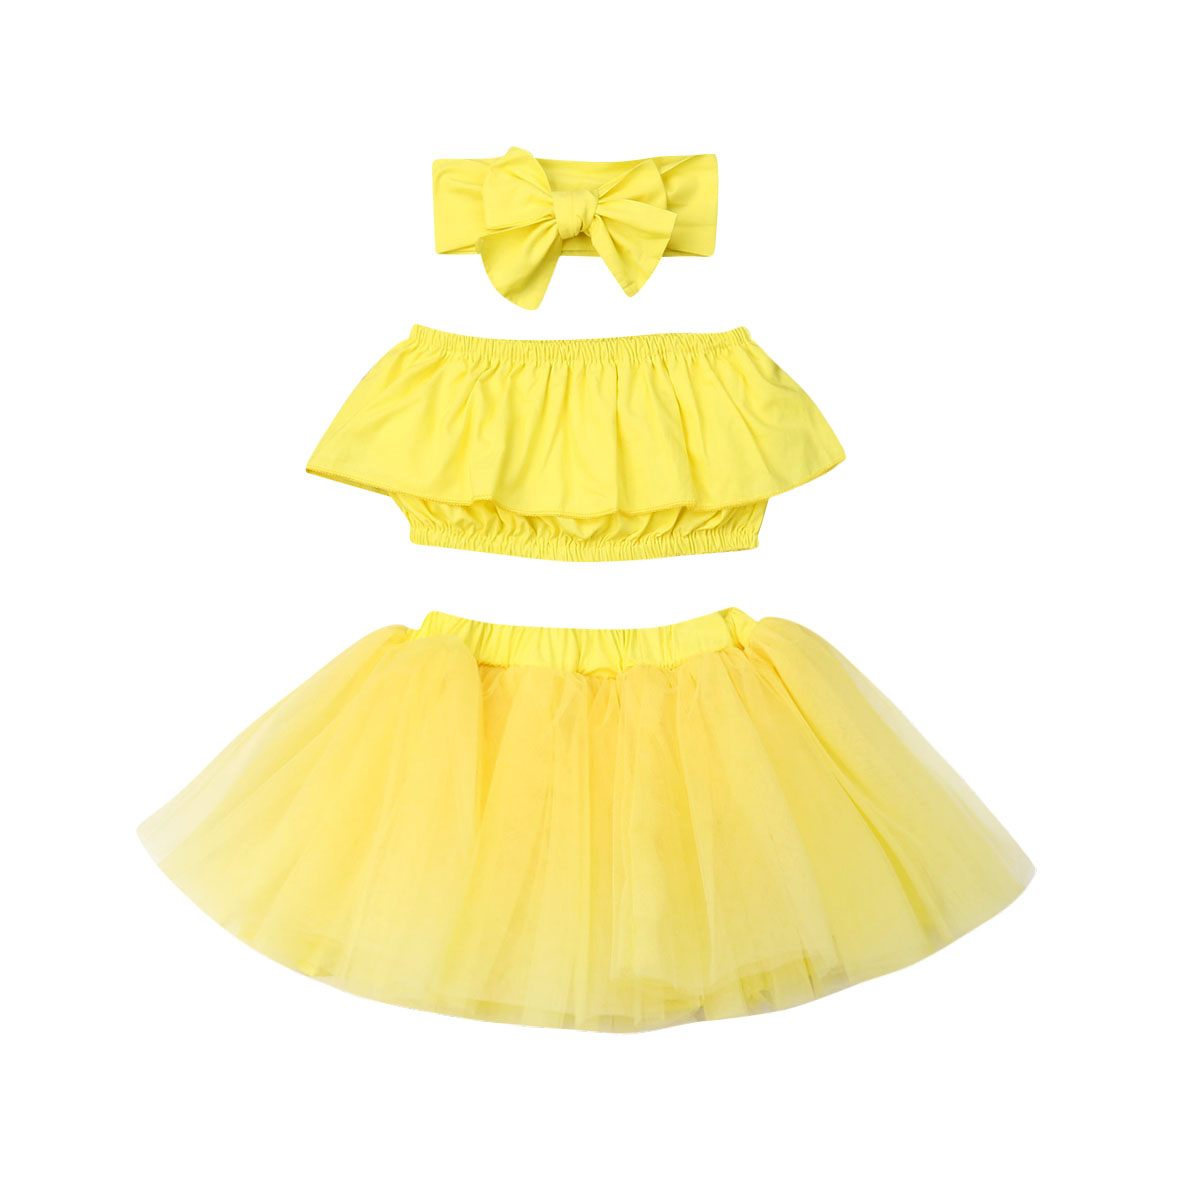 3PCS TODDLER BABY KIDS GIRLS TOPS TUTU TULLE DRESS HEADBAND SKIRT OUTFITS SET